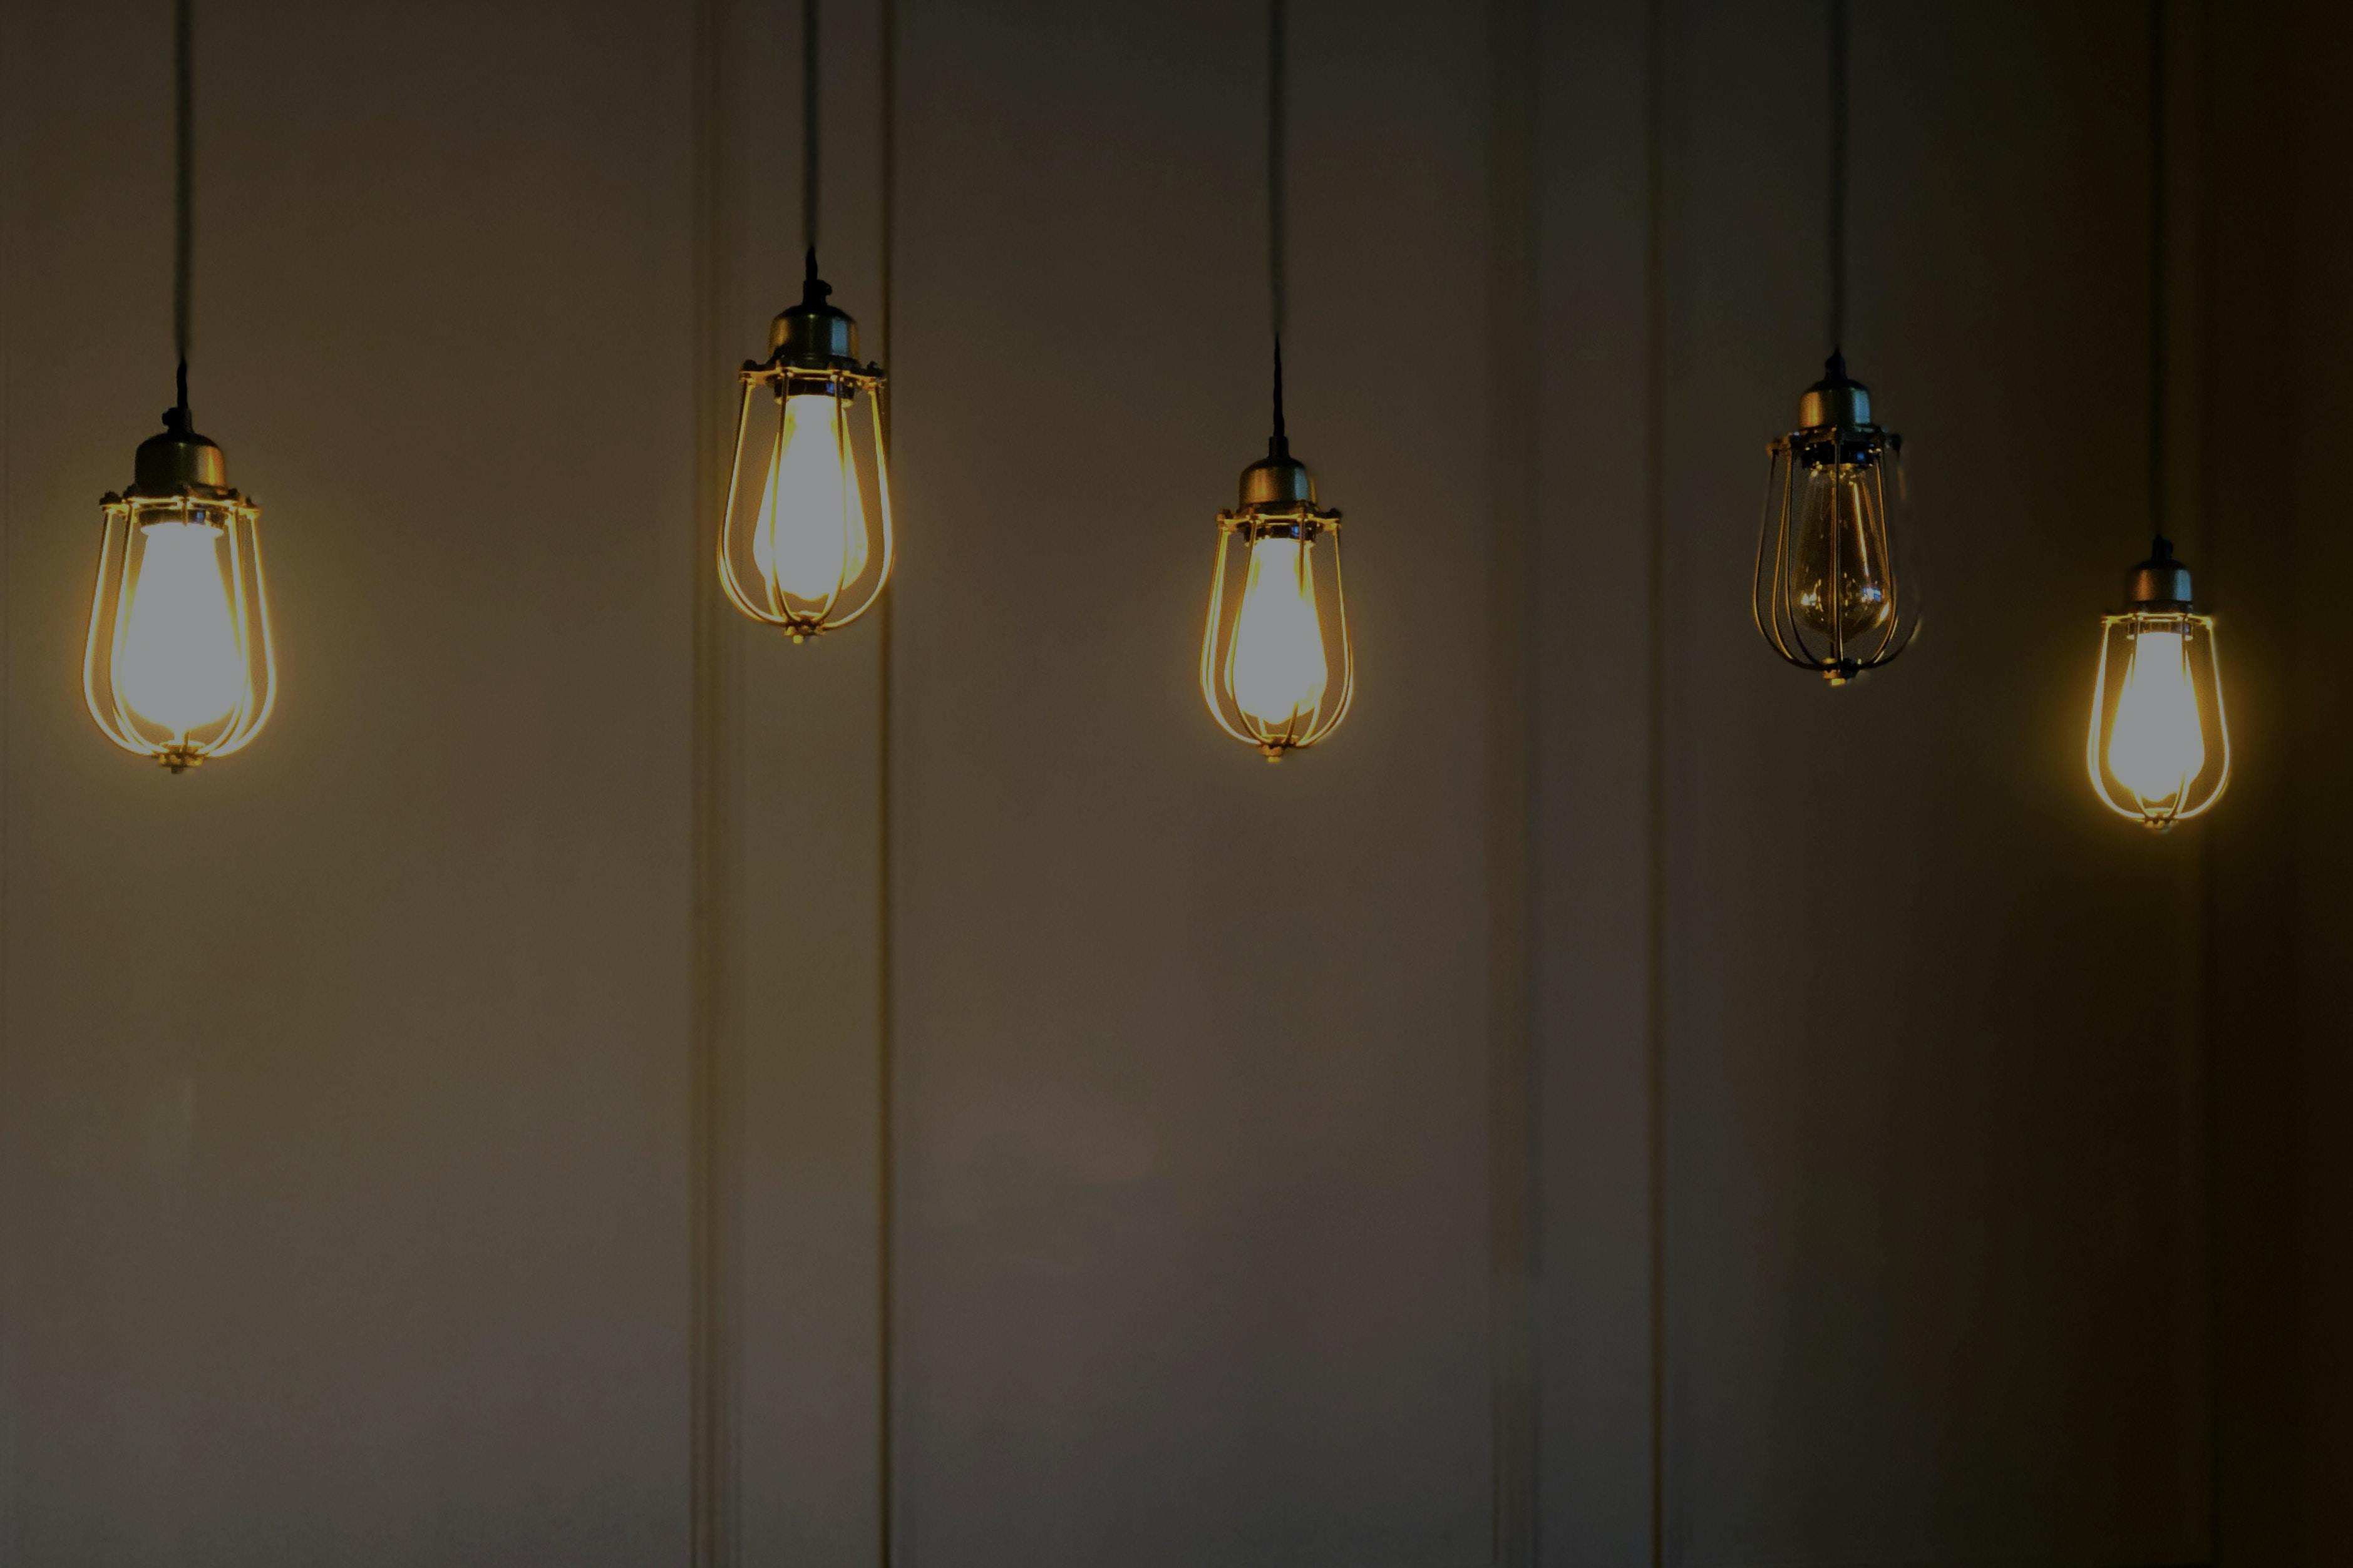 five rope lights